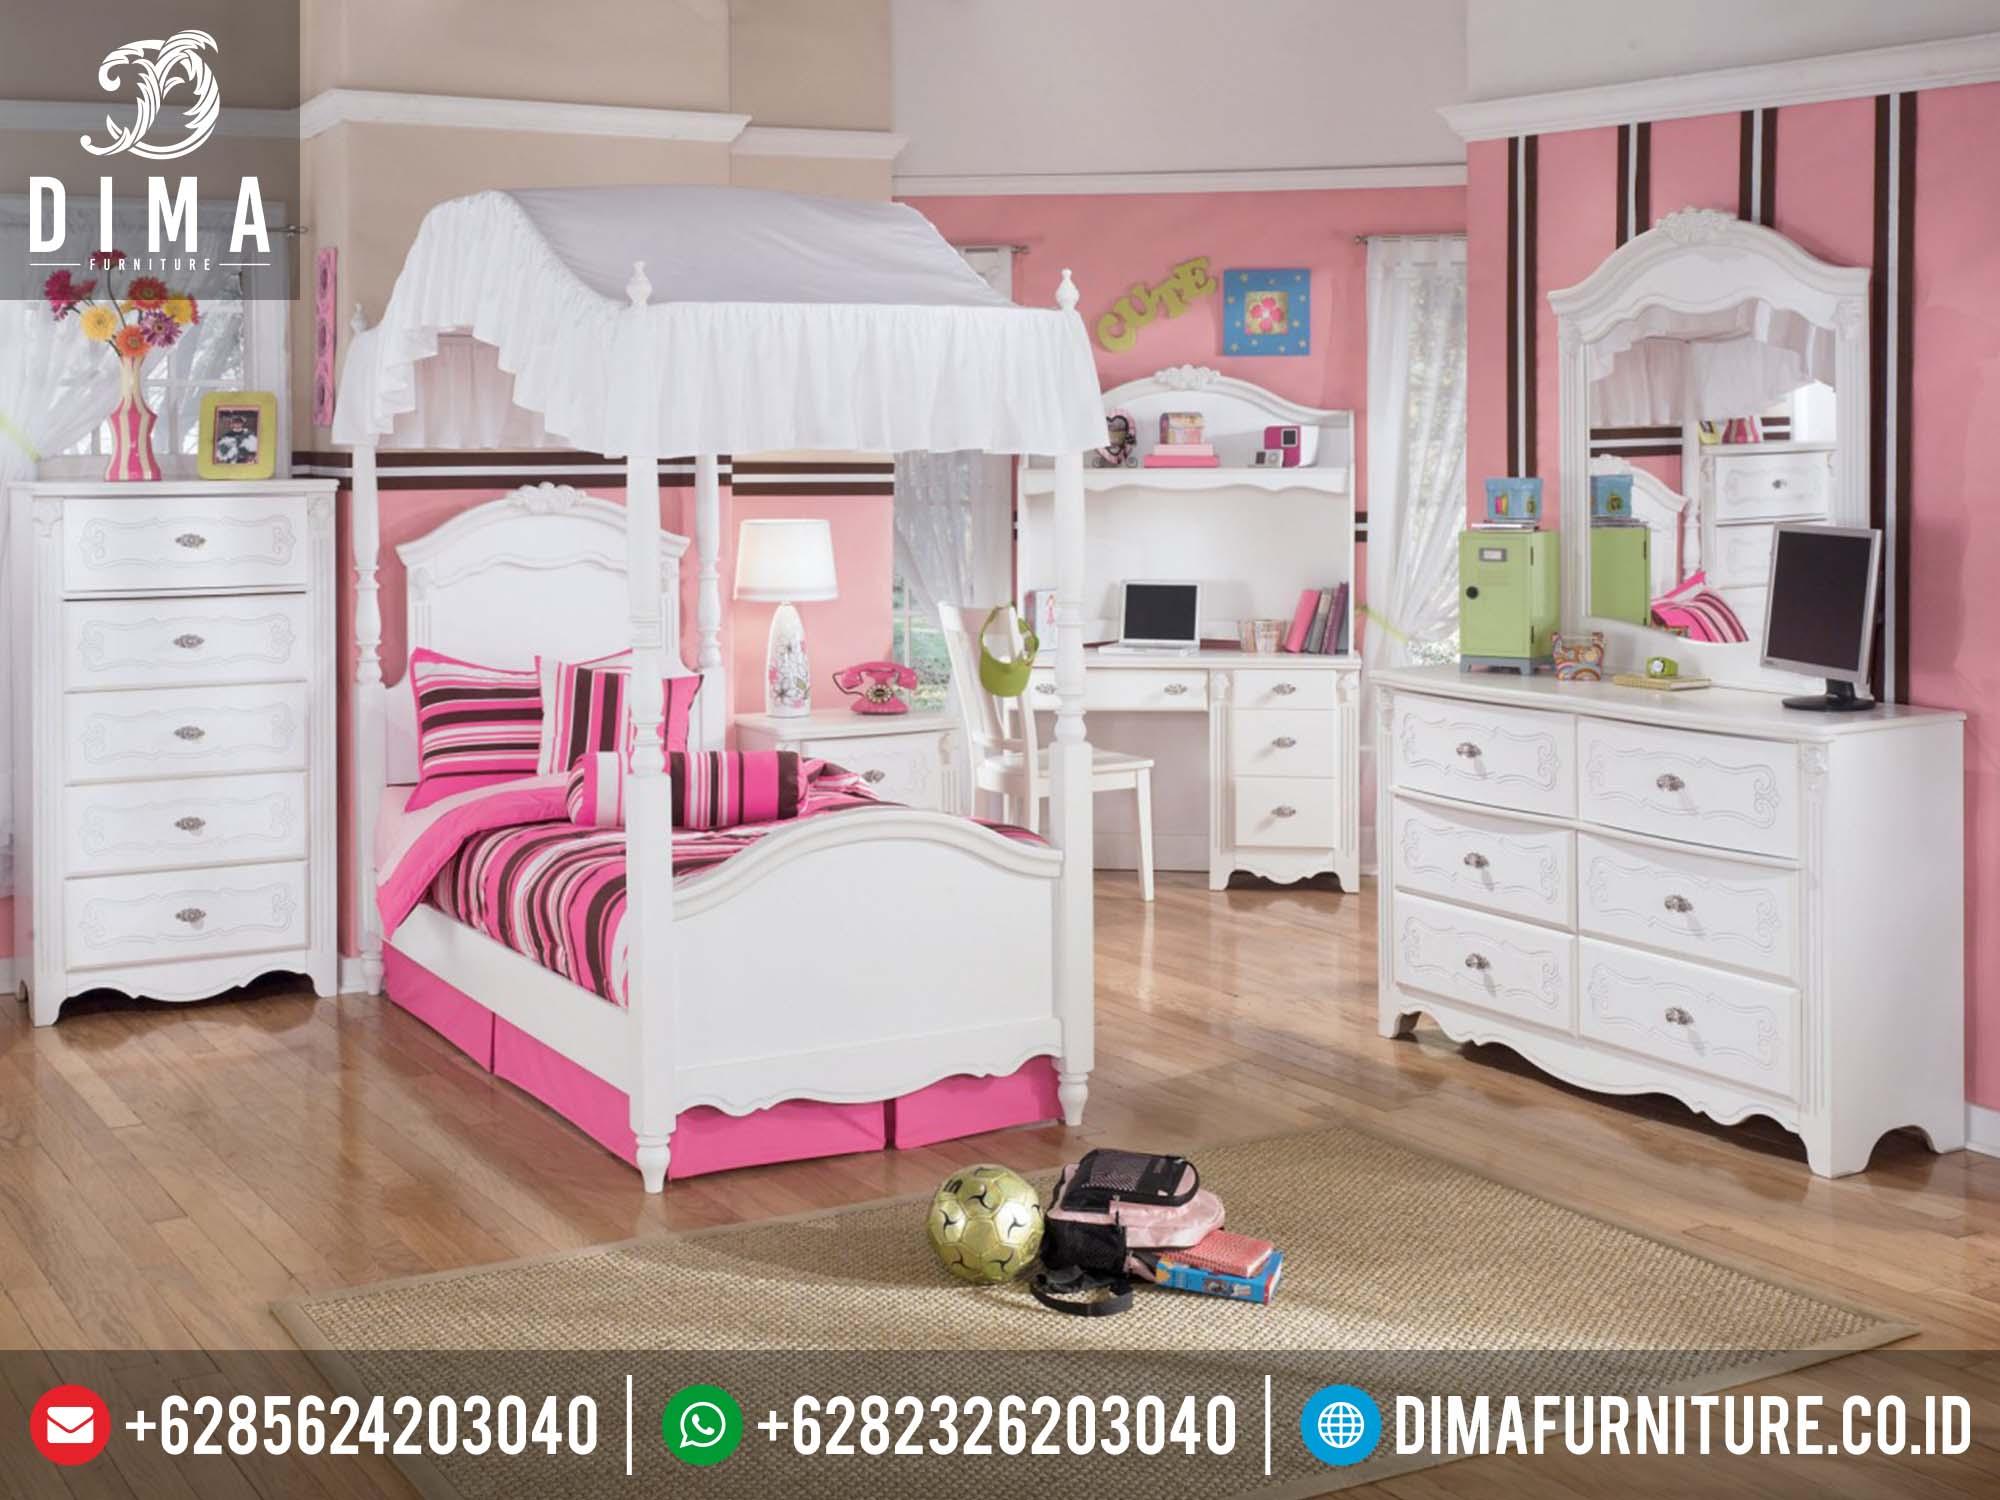 Set Kamar Tidur Anak Minimalis, Tempat Tidur Anak Tingkat, Kamar Anak Minimalis Jepara DF-0137